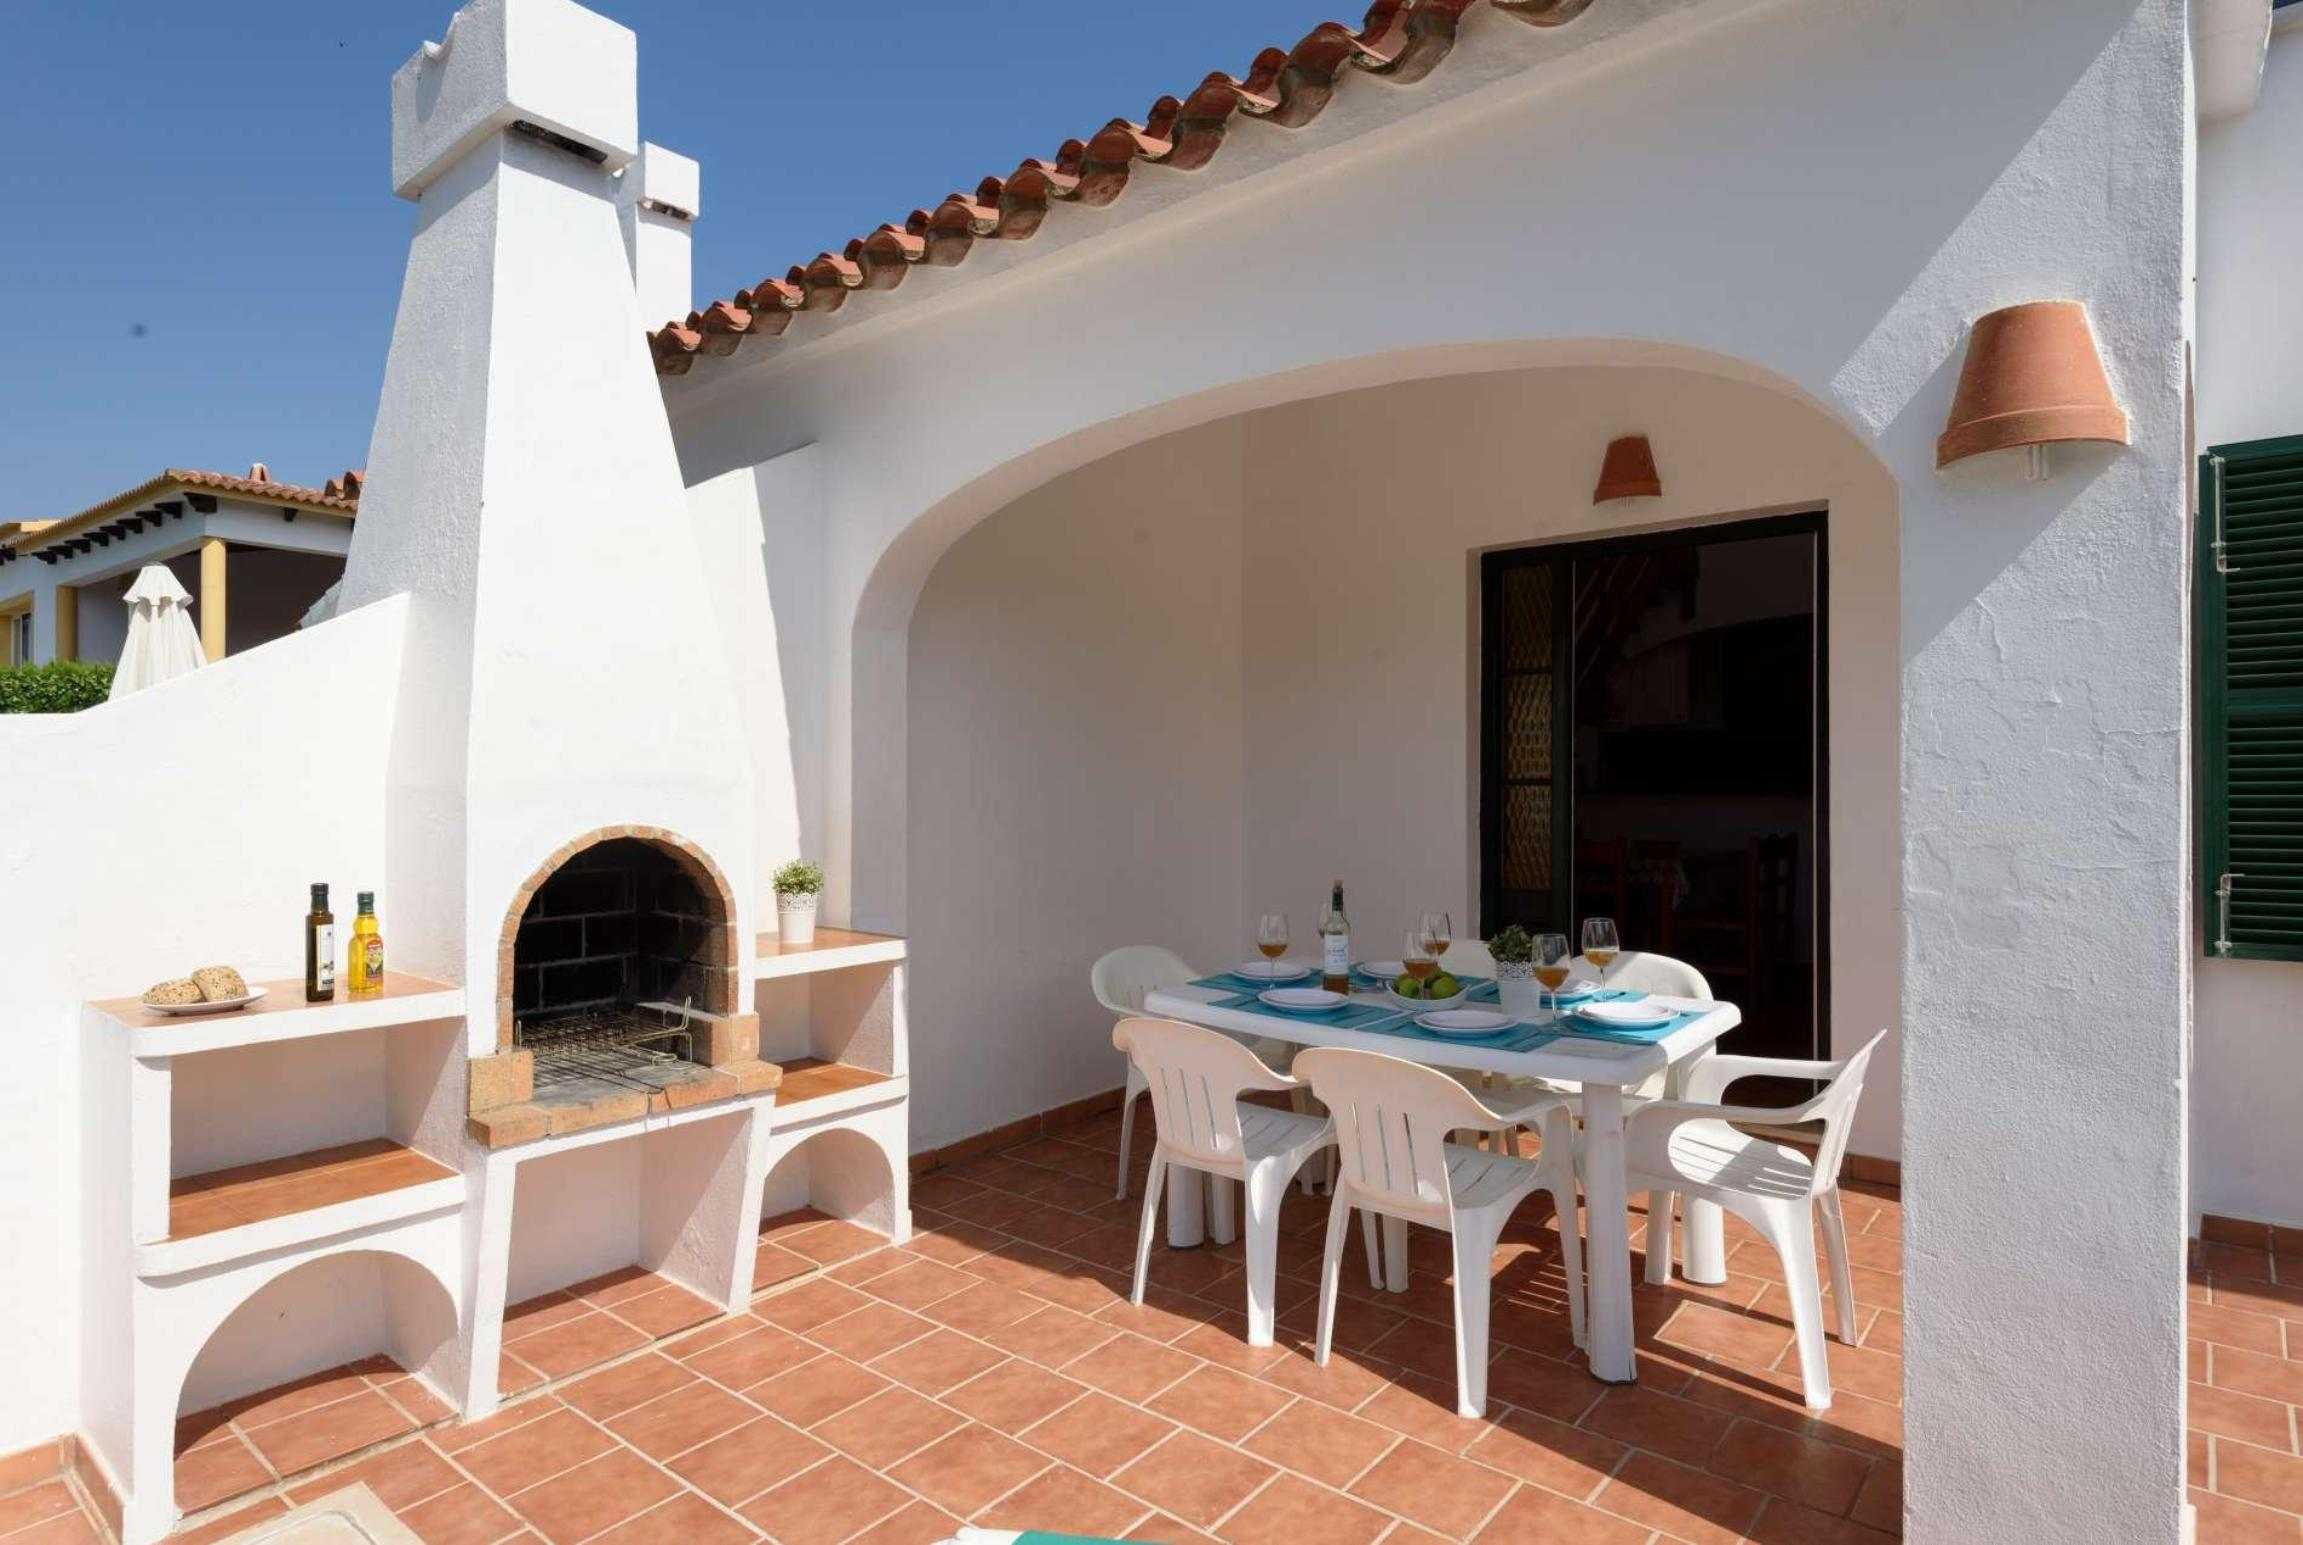 Ferienhaus Eulalia I (2653535), Arenal De'N Castell, Menorca, Balearische Inseln, Spanien, Bild 24